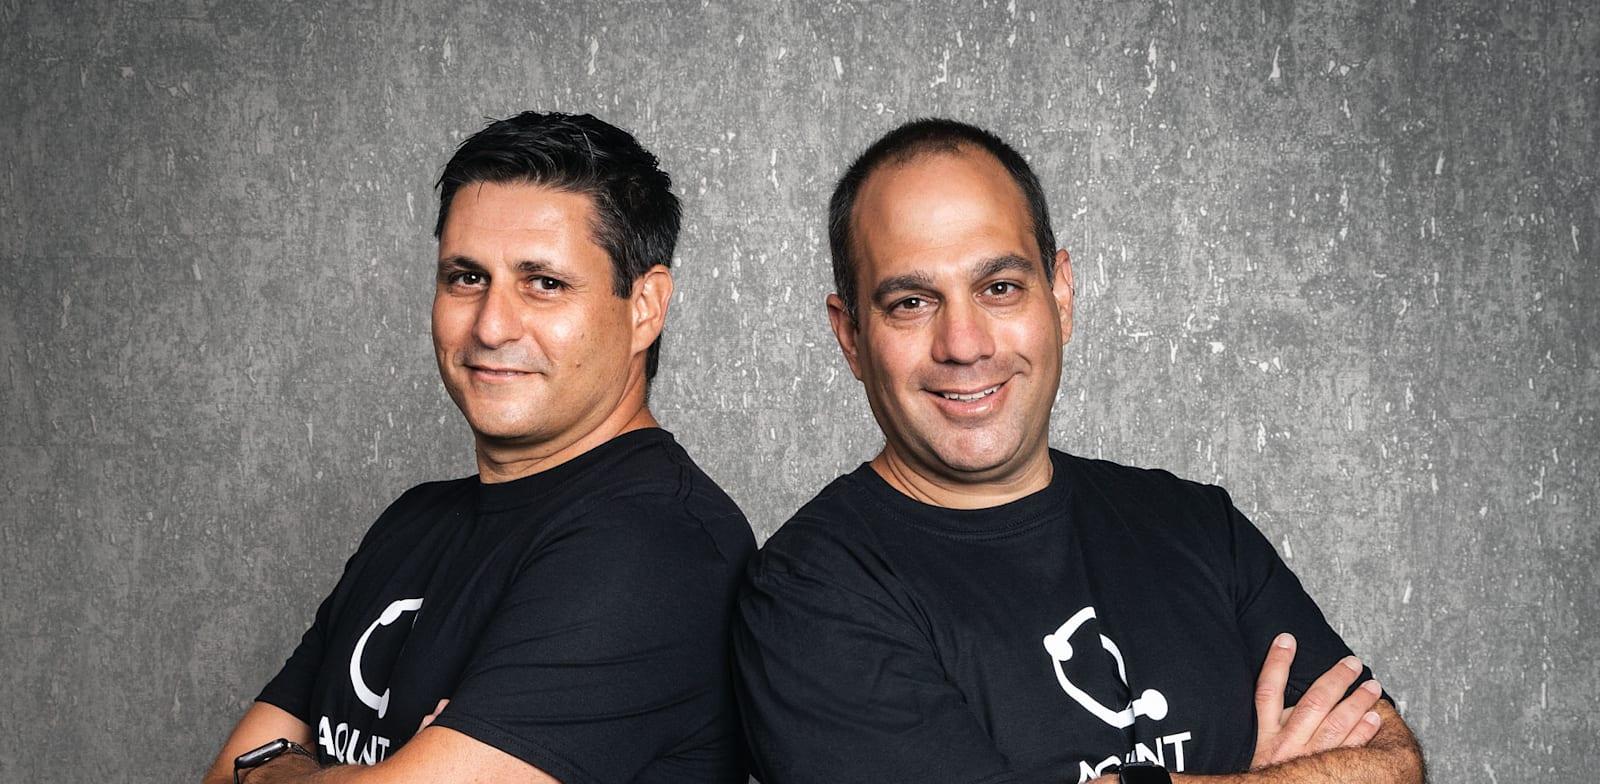 Aquant founders Photo: PR